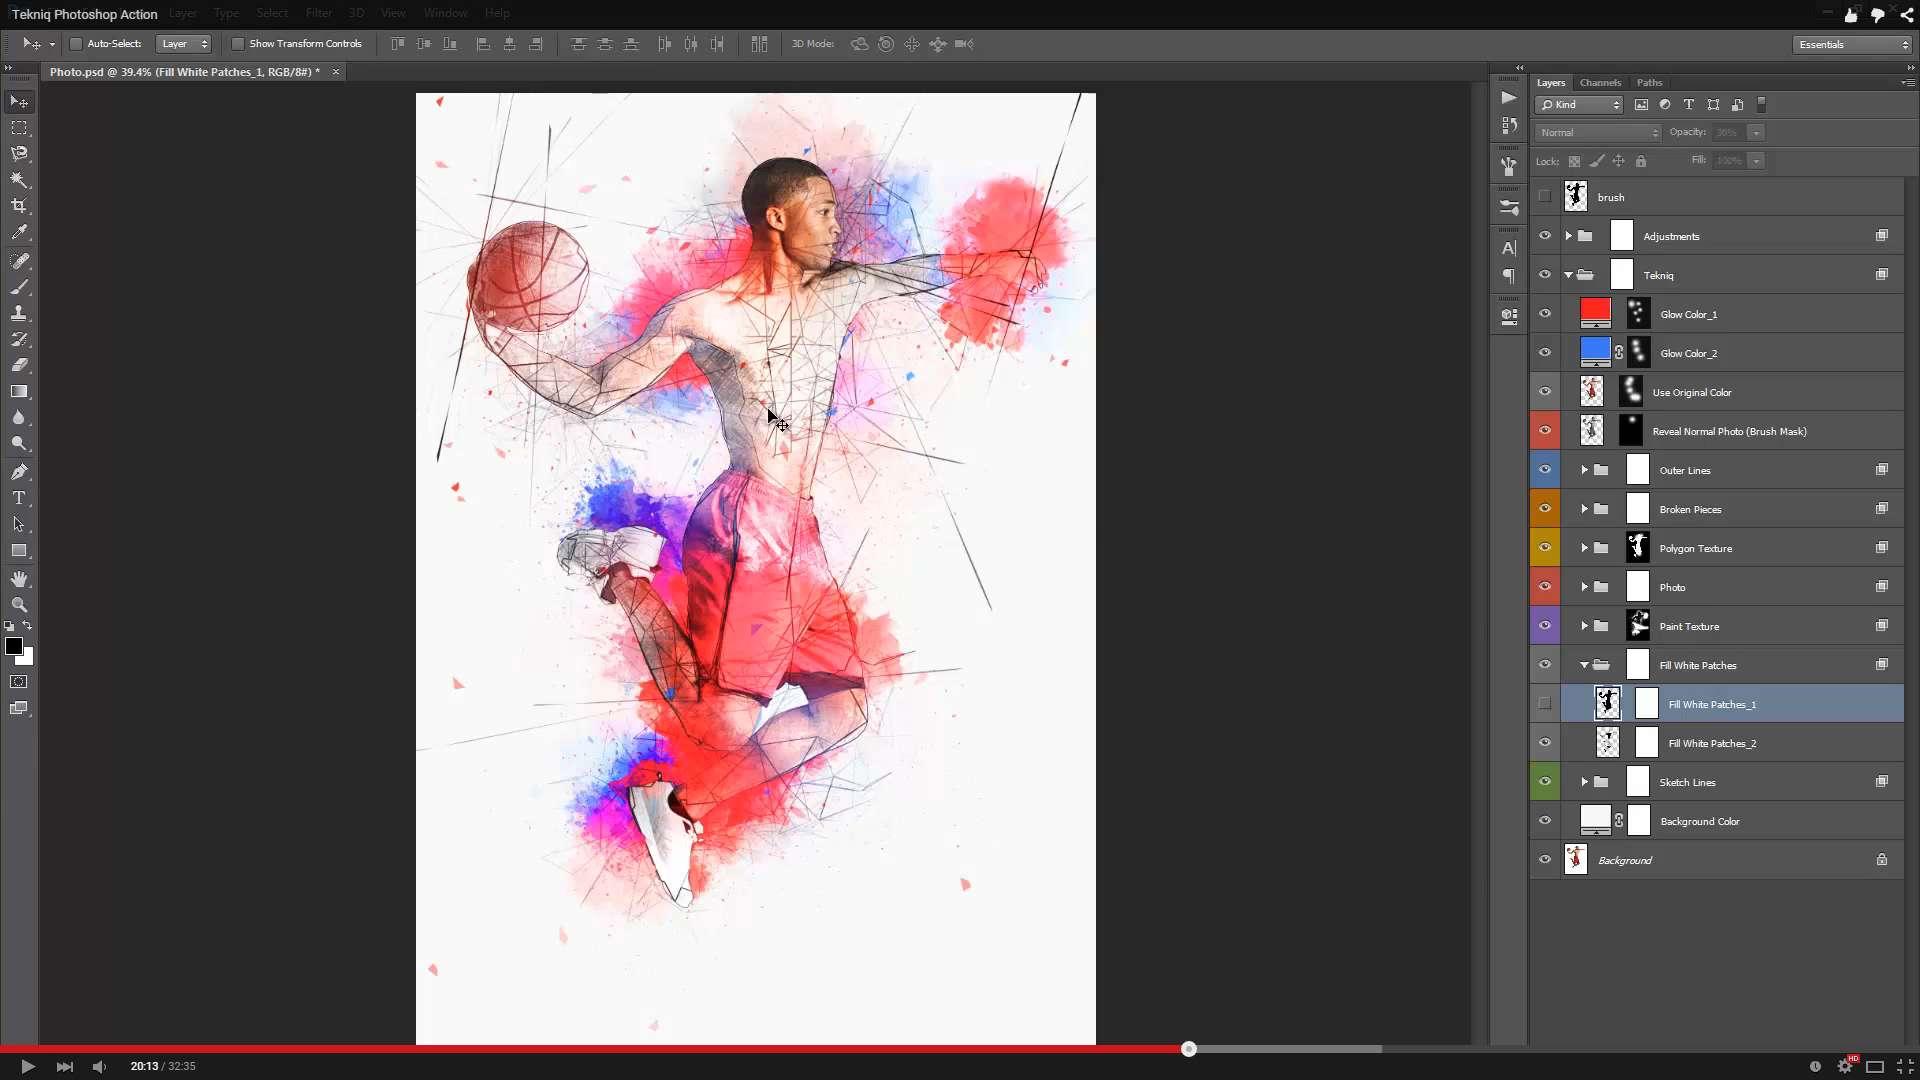 Tekniq Photoshop Action